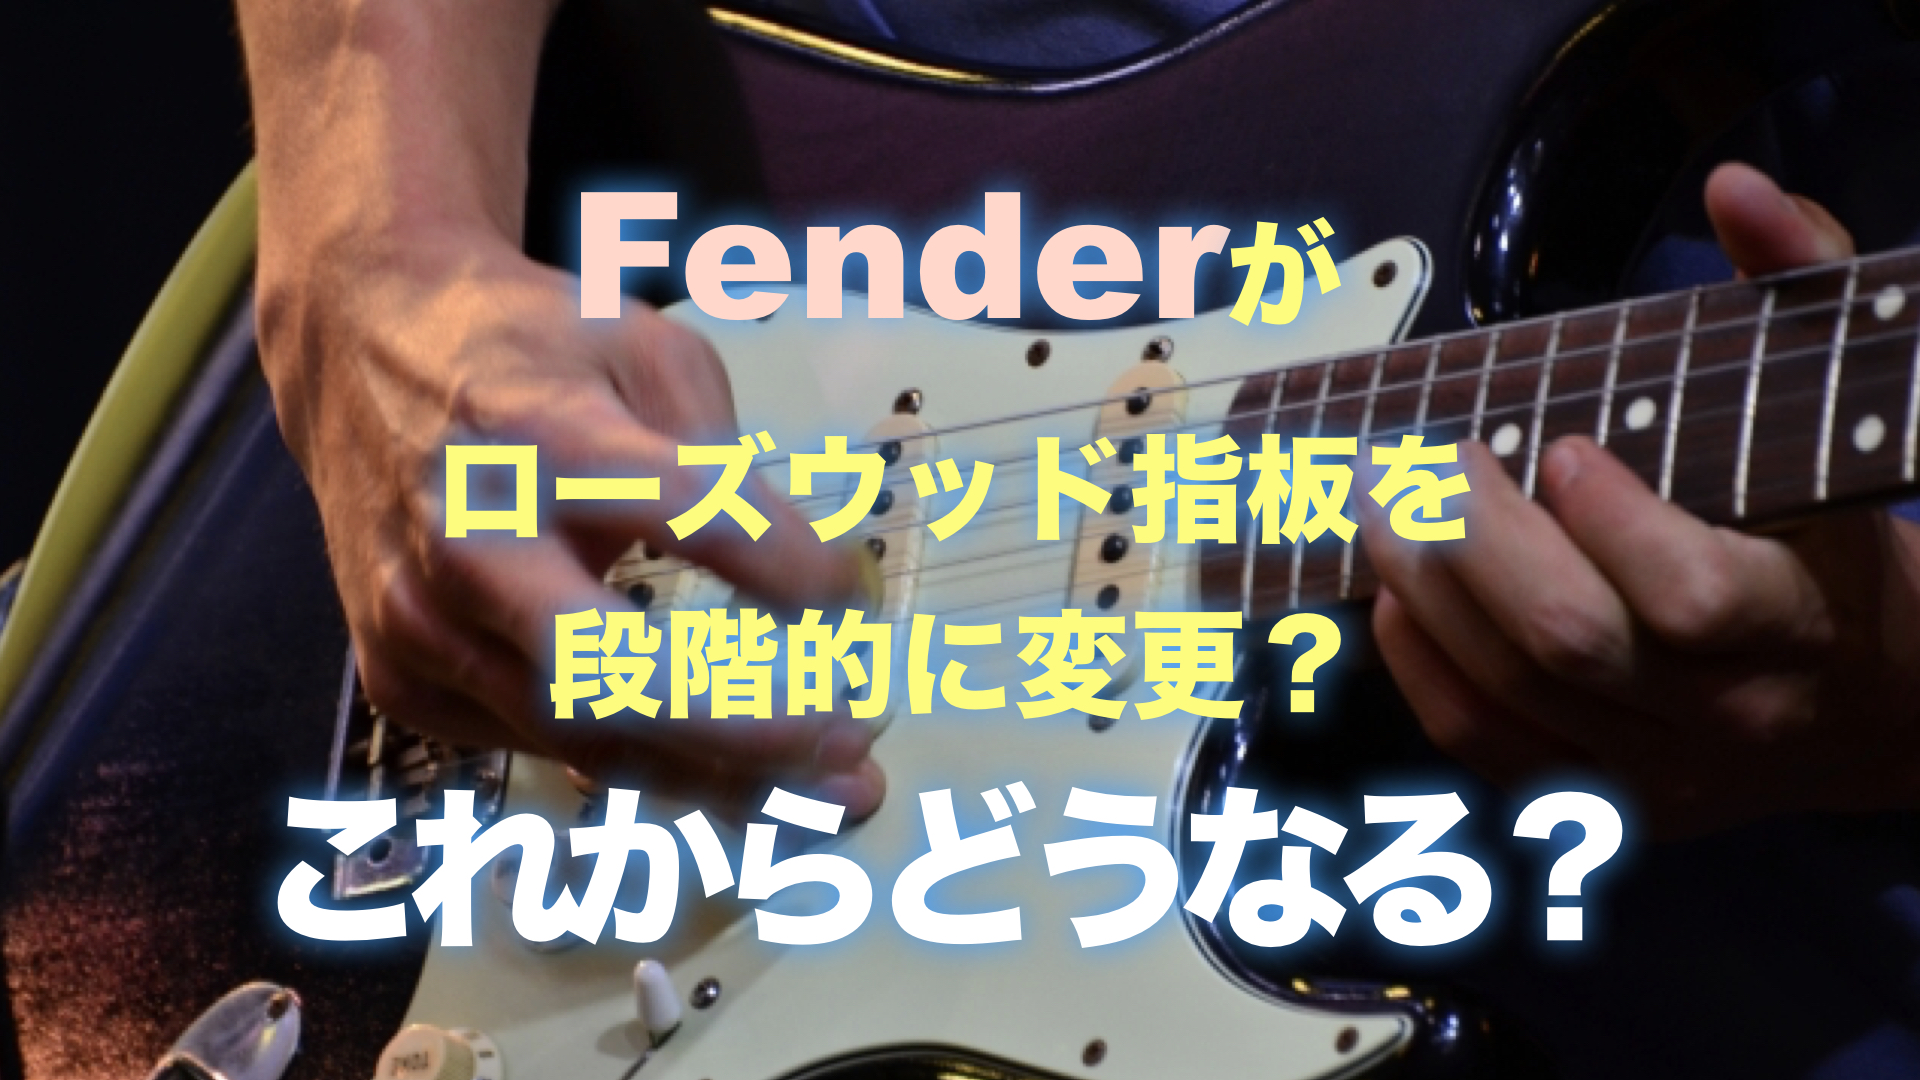 Fenderがローズウッド指板を段階的に変更?これからどうなる?